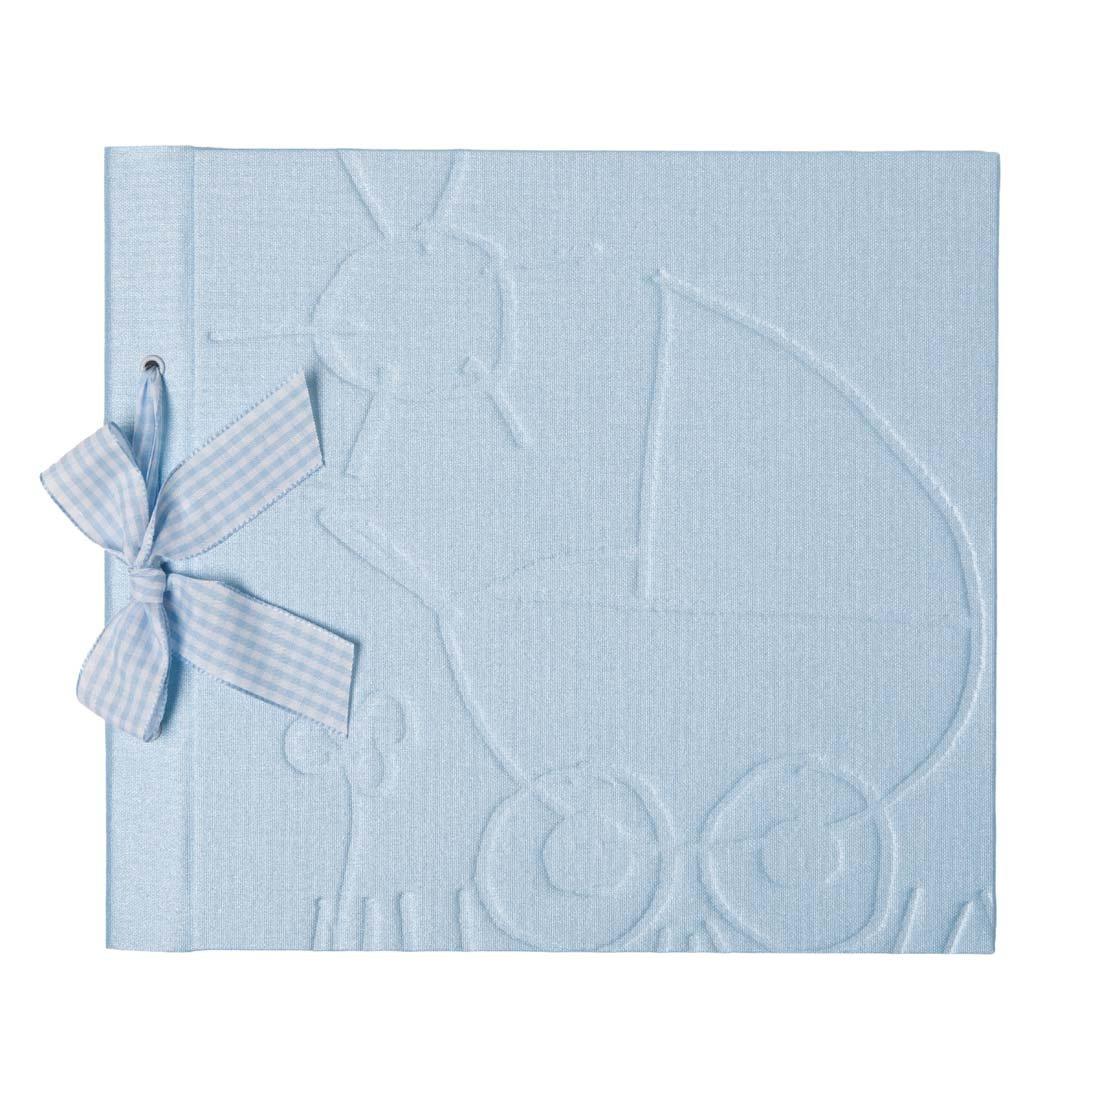 Pepa Paper - Libro bebé temático castellano Celeste